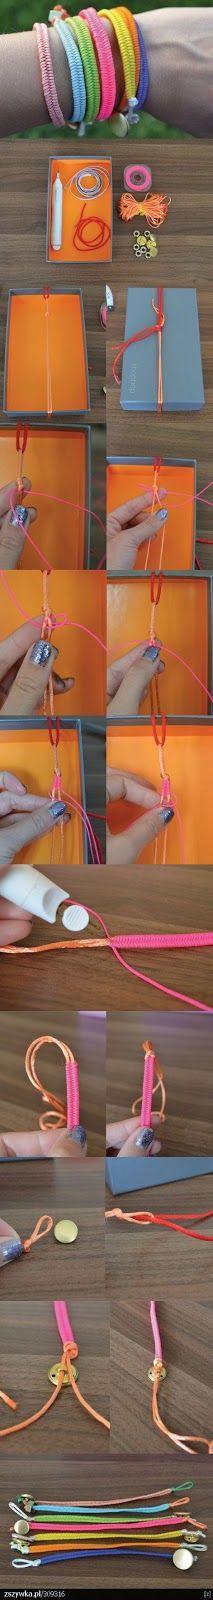 Friendship Bracelets Handmade Wholesale LOT 25 MIX From Peru – Jewelry & Gifts Bright neon Bracelets Fishtail Bracelet, Bracelet Fil, Neon Bracelets, Summer Bracelets, Wrap Bracelets, Braided Bracelets, Macrame Bracelets, Jewelry Crafts, Handmade Jewelry